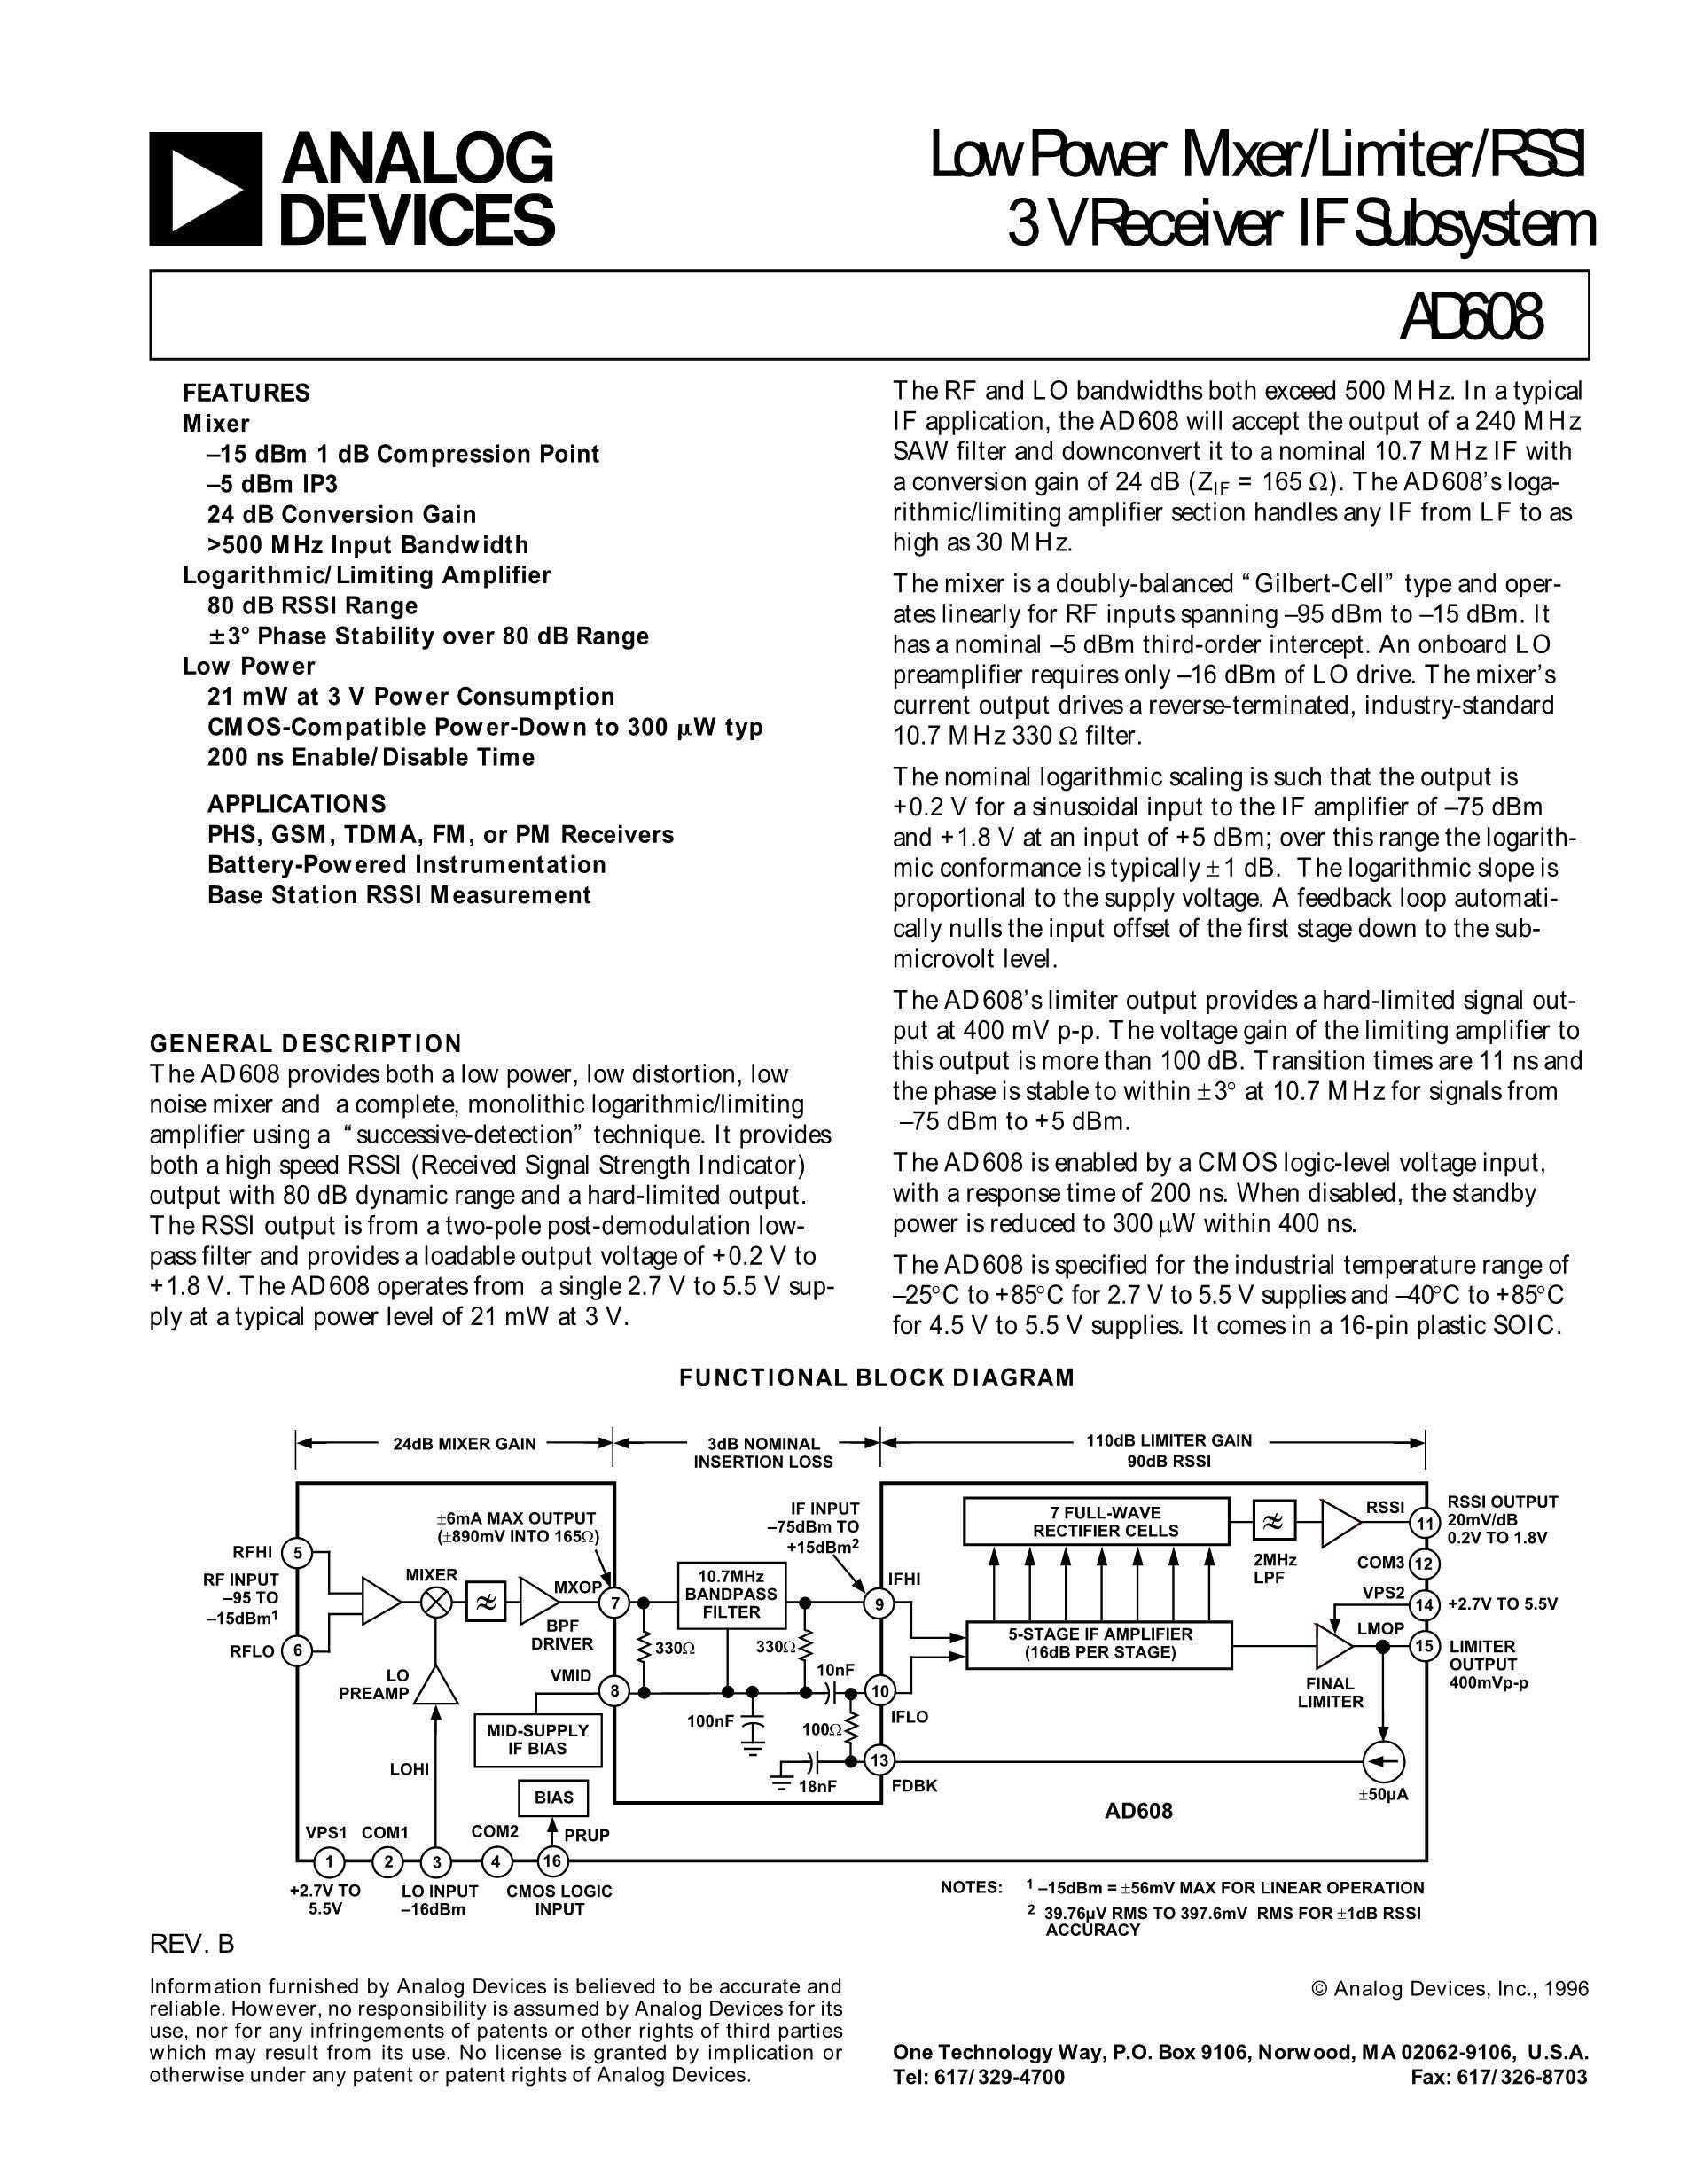 AD603ARX-AWP's pdf picture 1